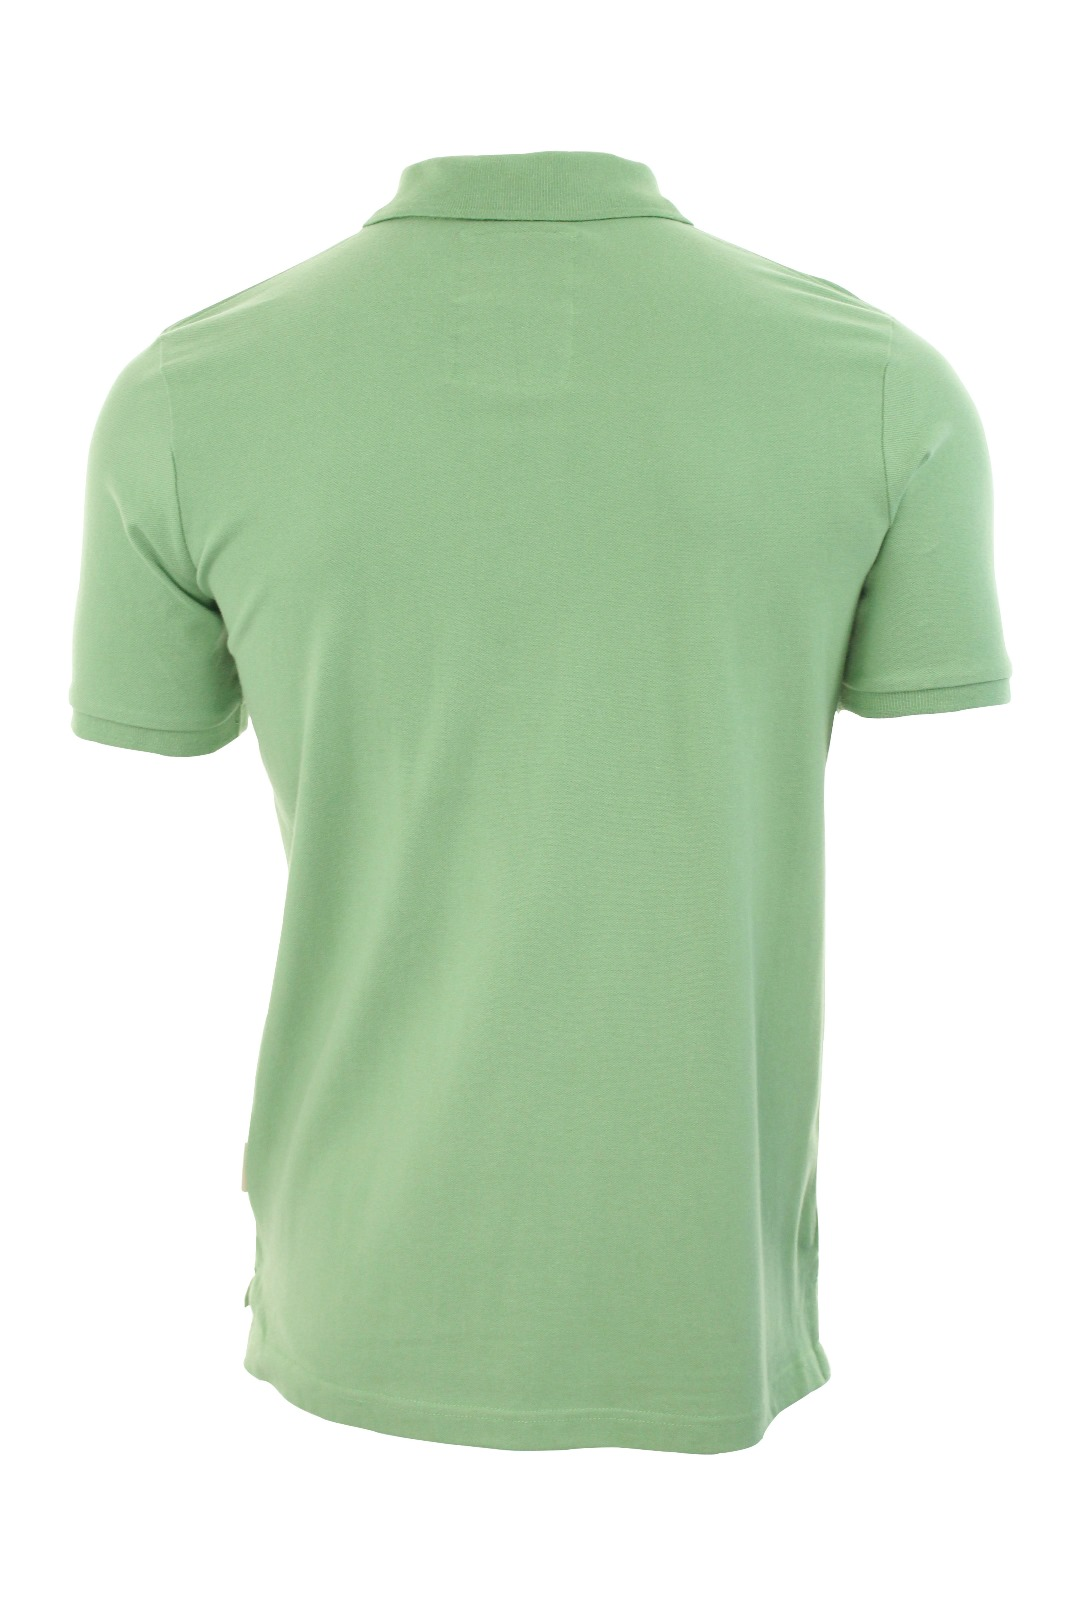 Tokyo-Laundry-Mens-Polo-T-Shirt-039-Sophomore-039-Short-Sleeved-Chest-Logo